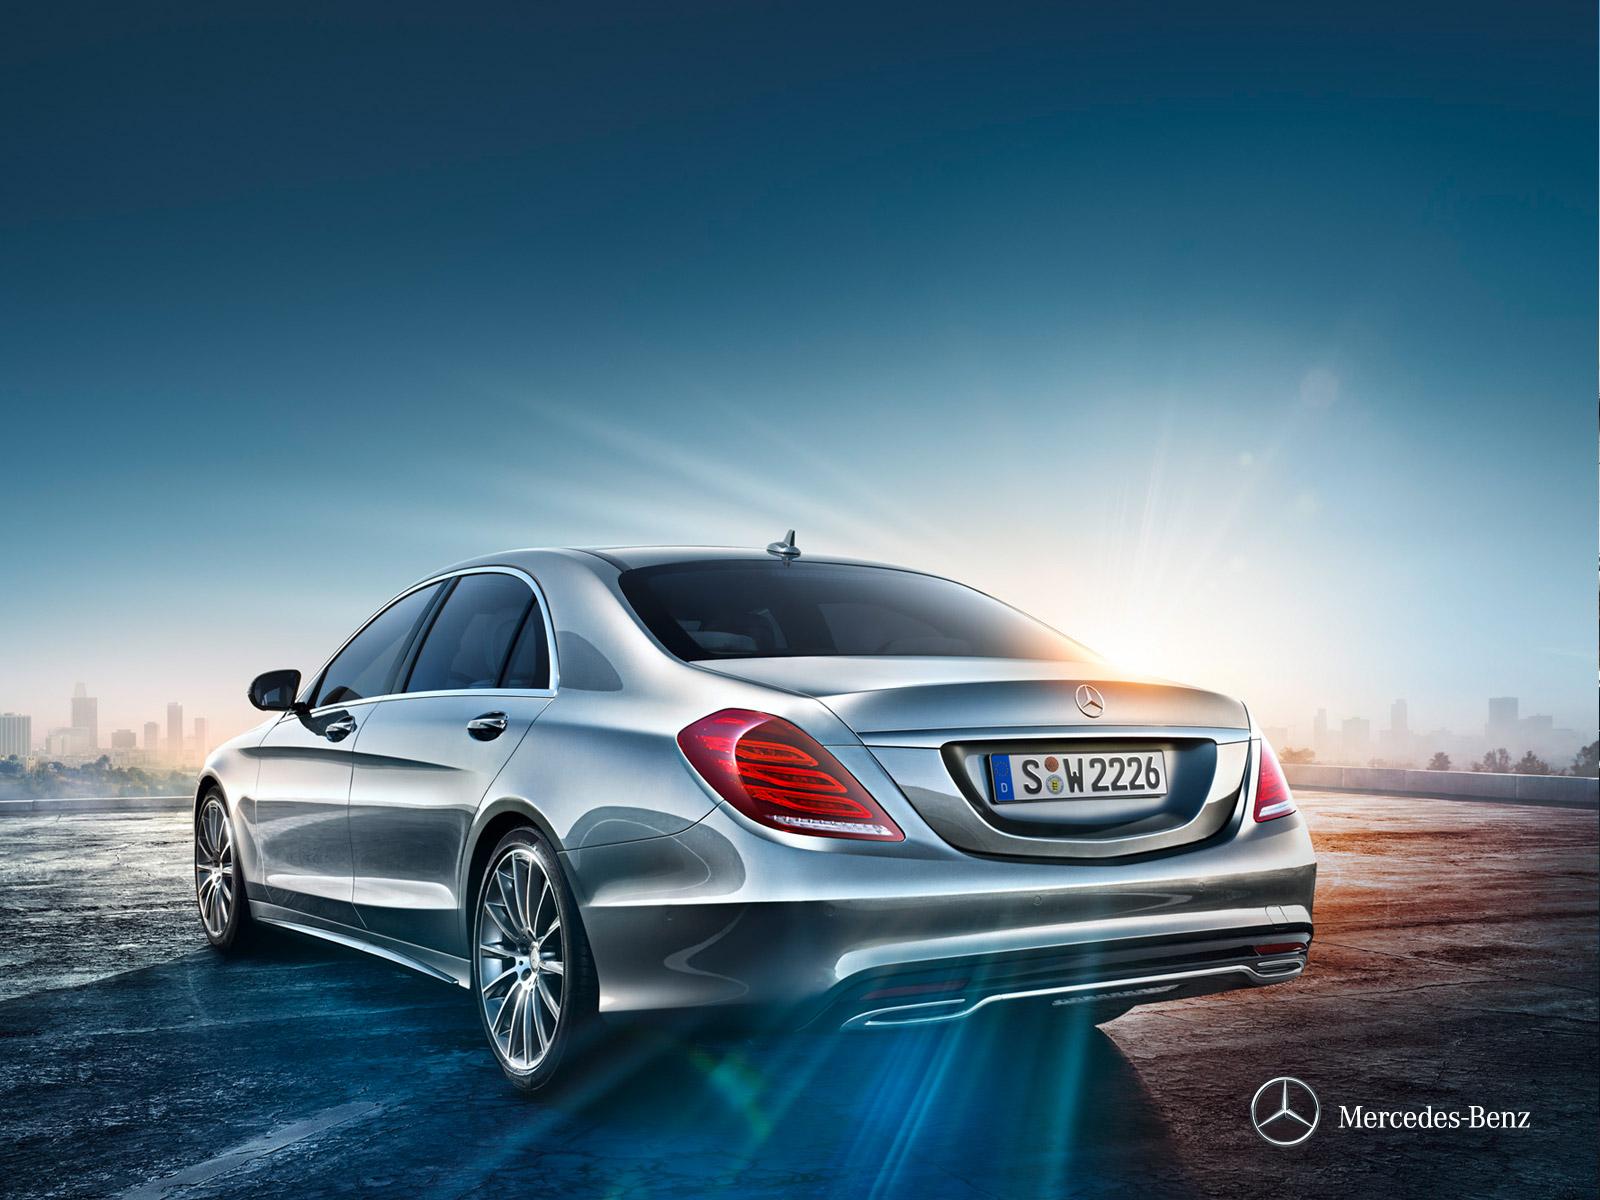 automotivegeneral 2015 mercedes benz vision g code wallpapers 1600x1200